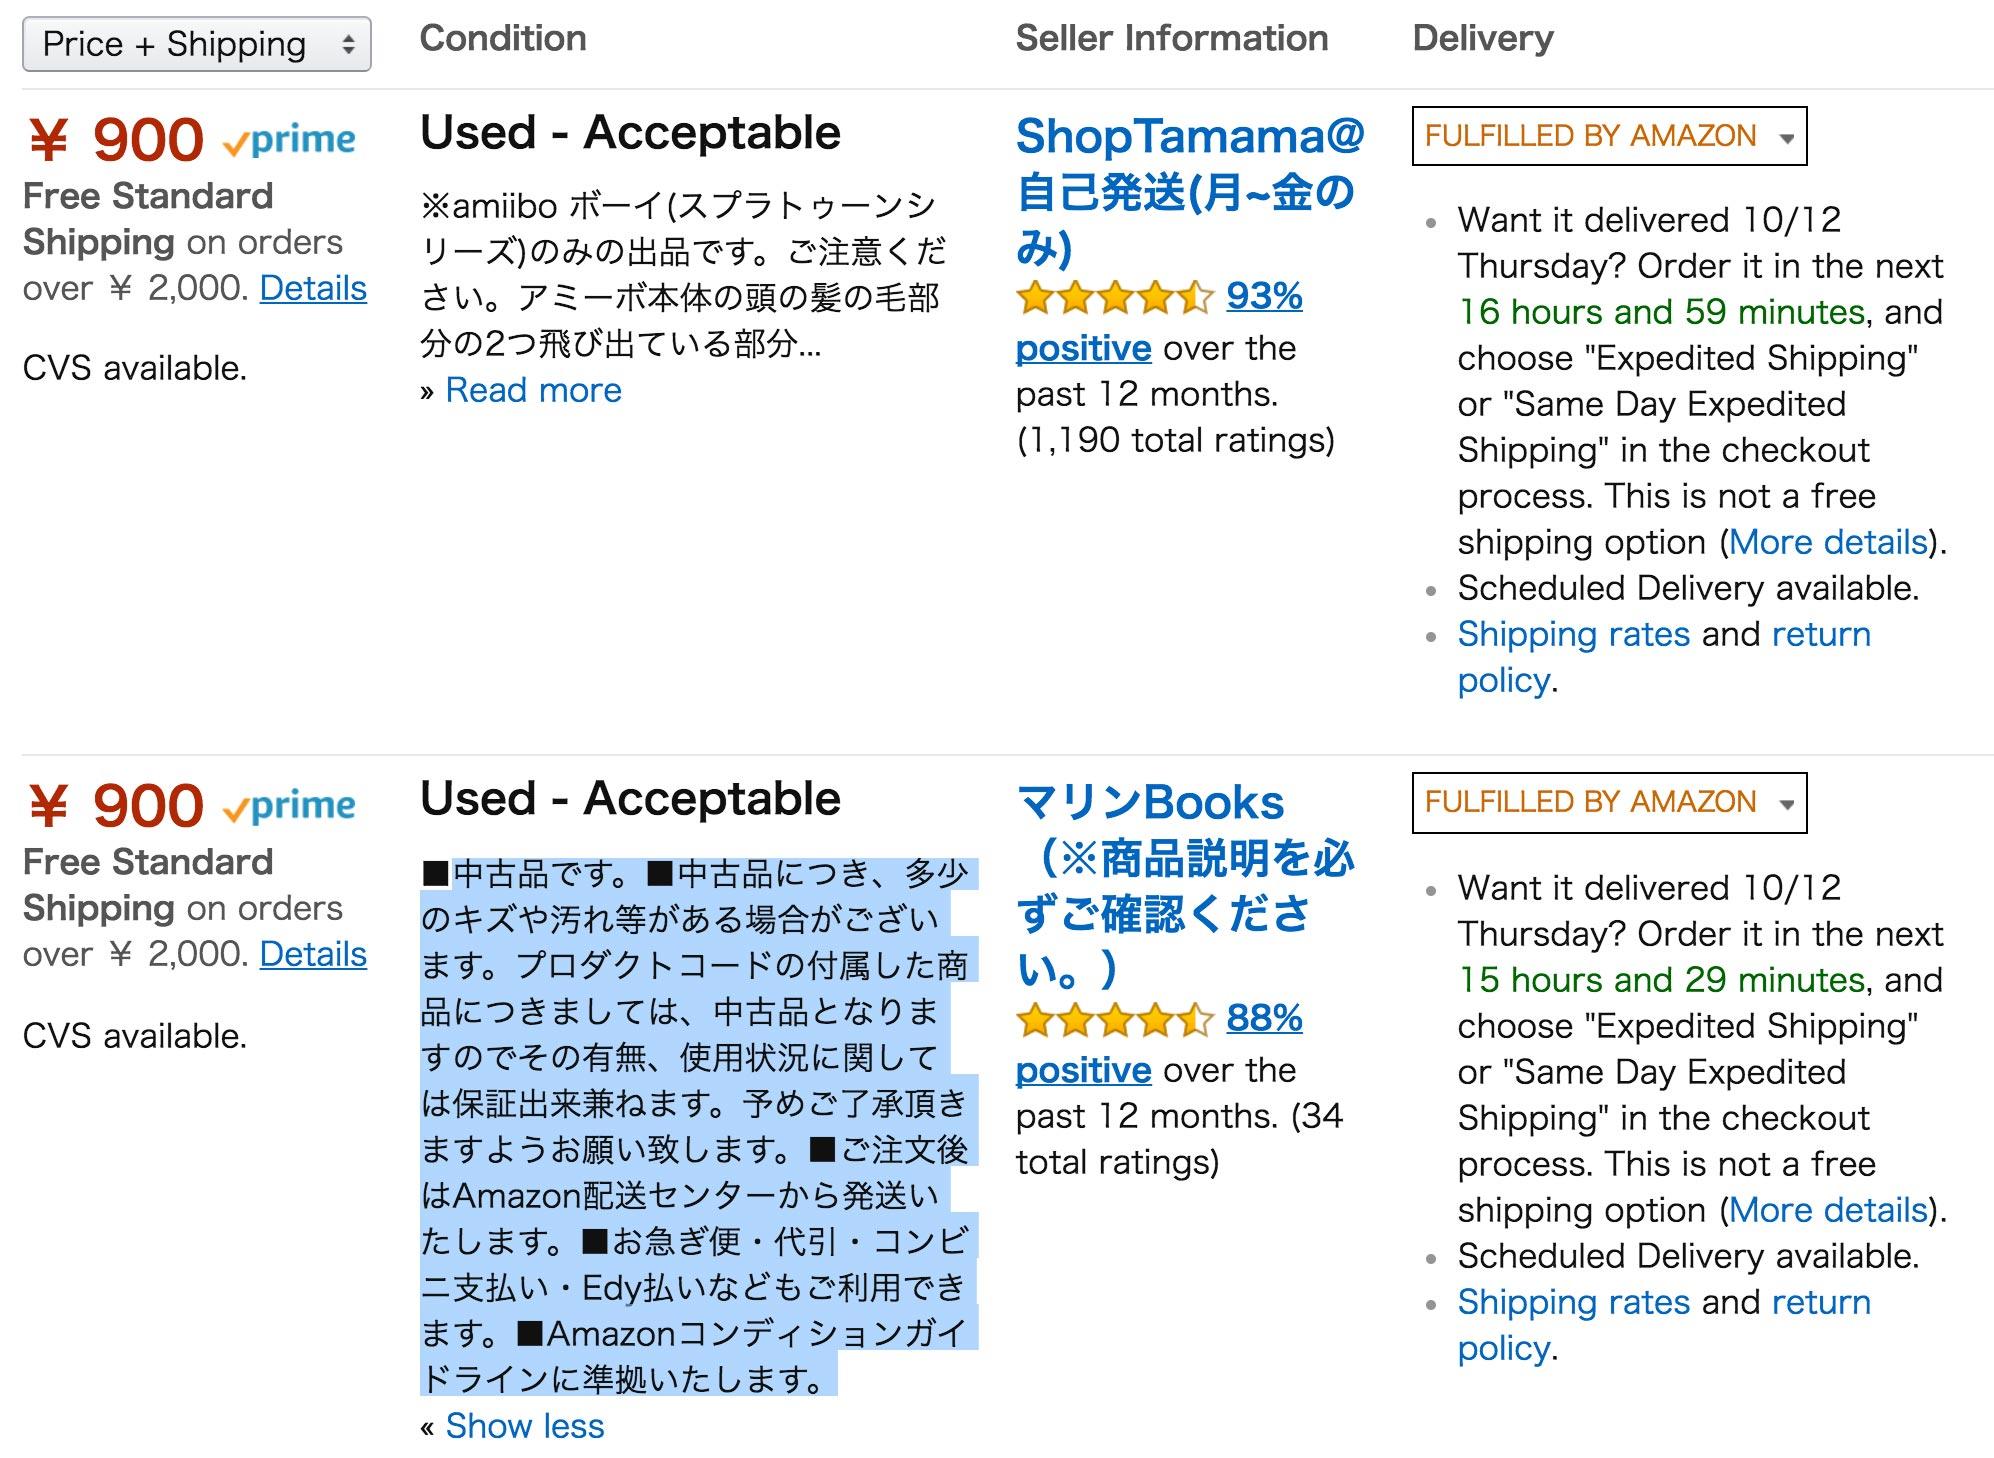 used item description